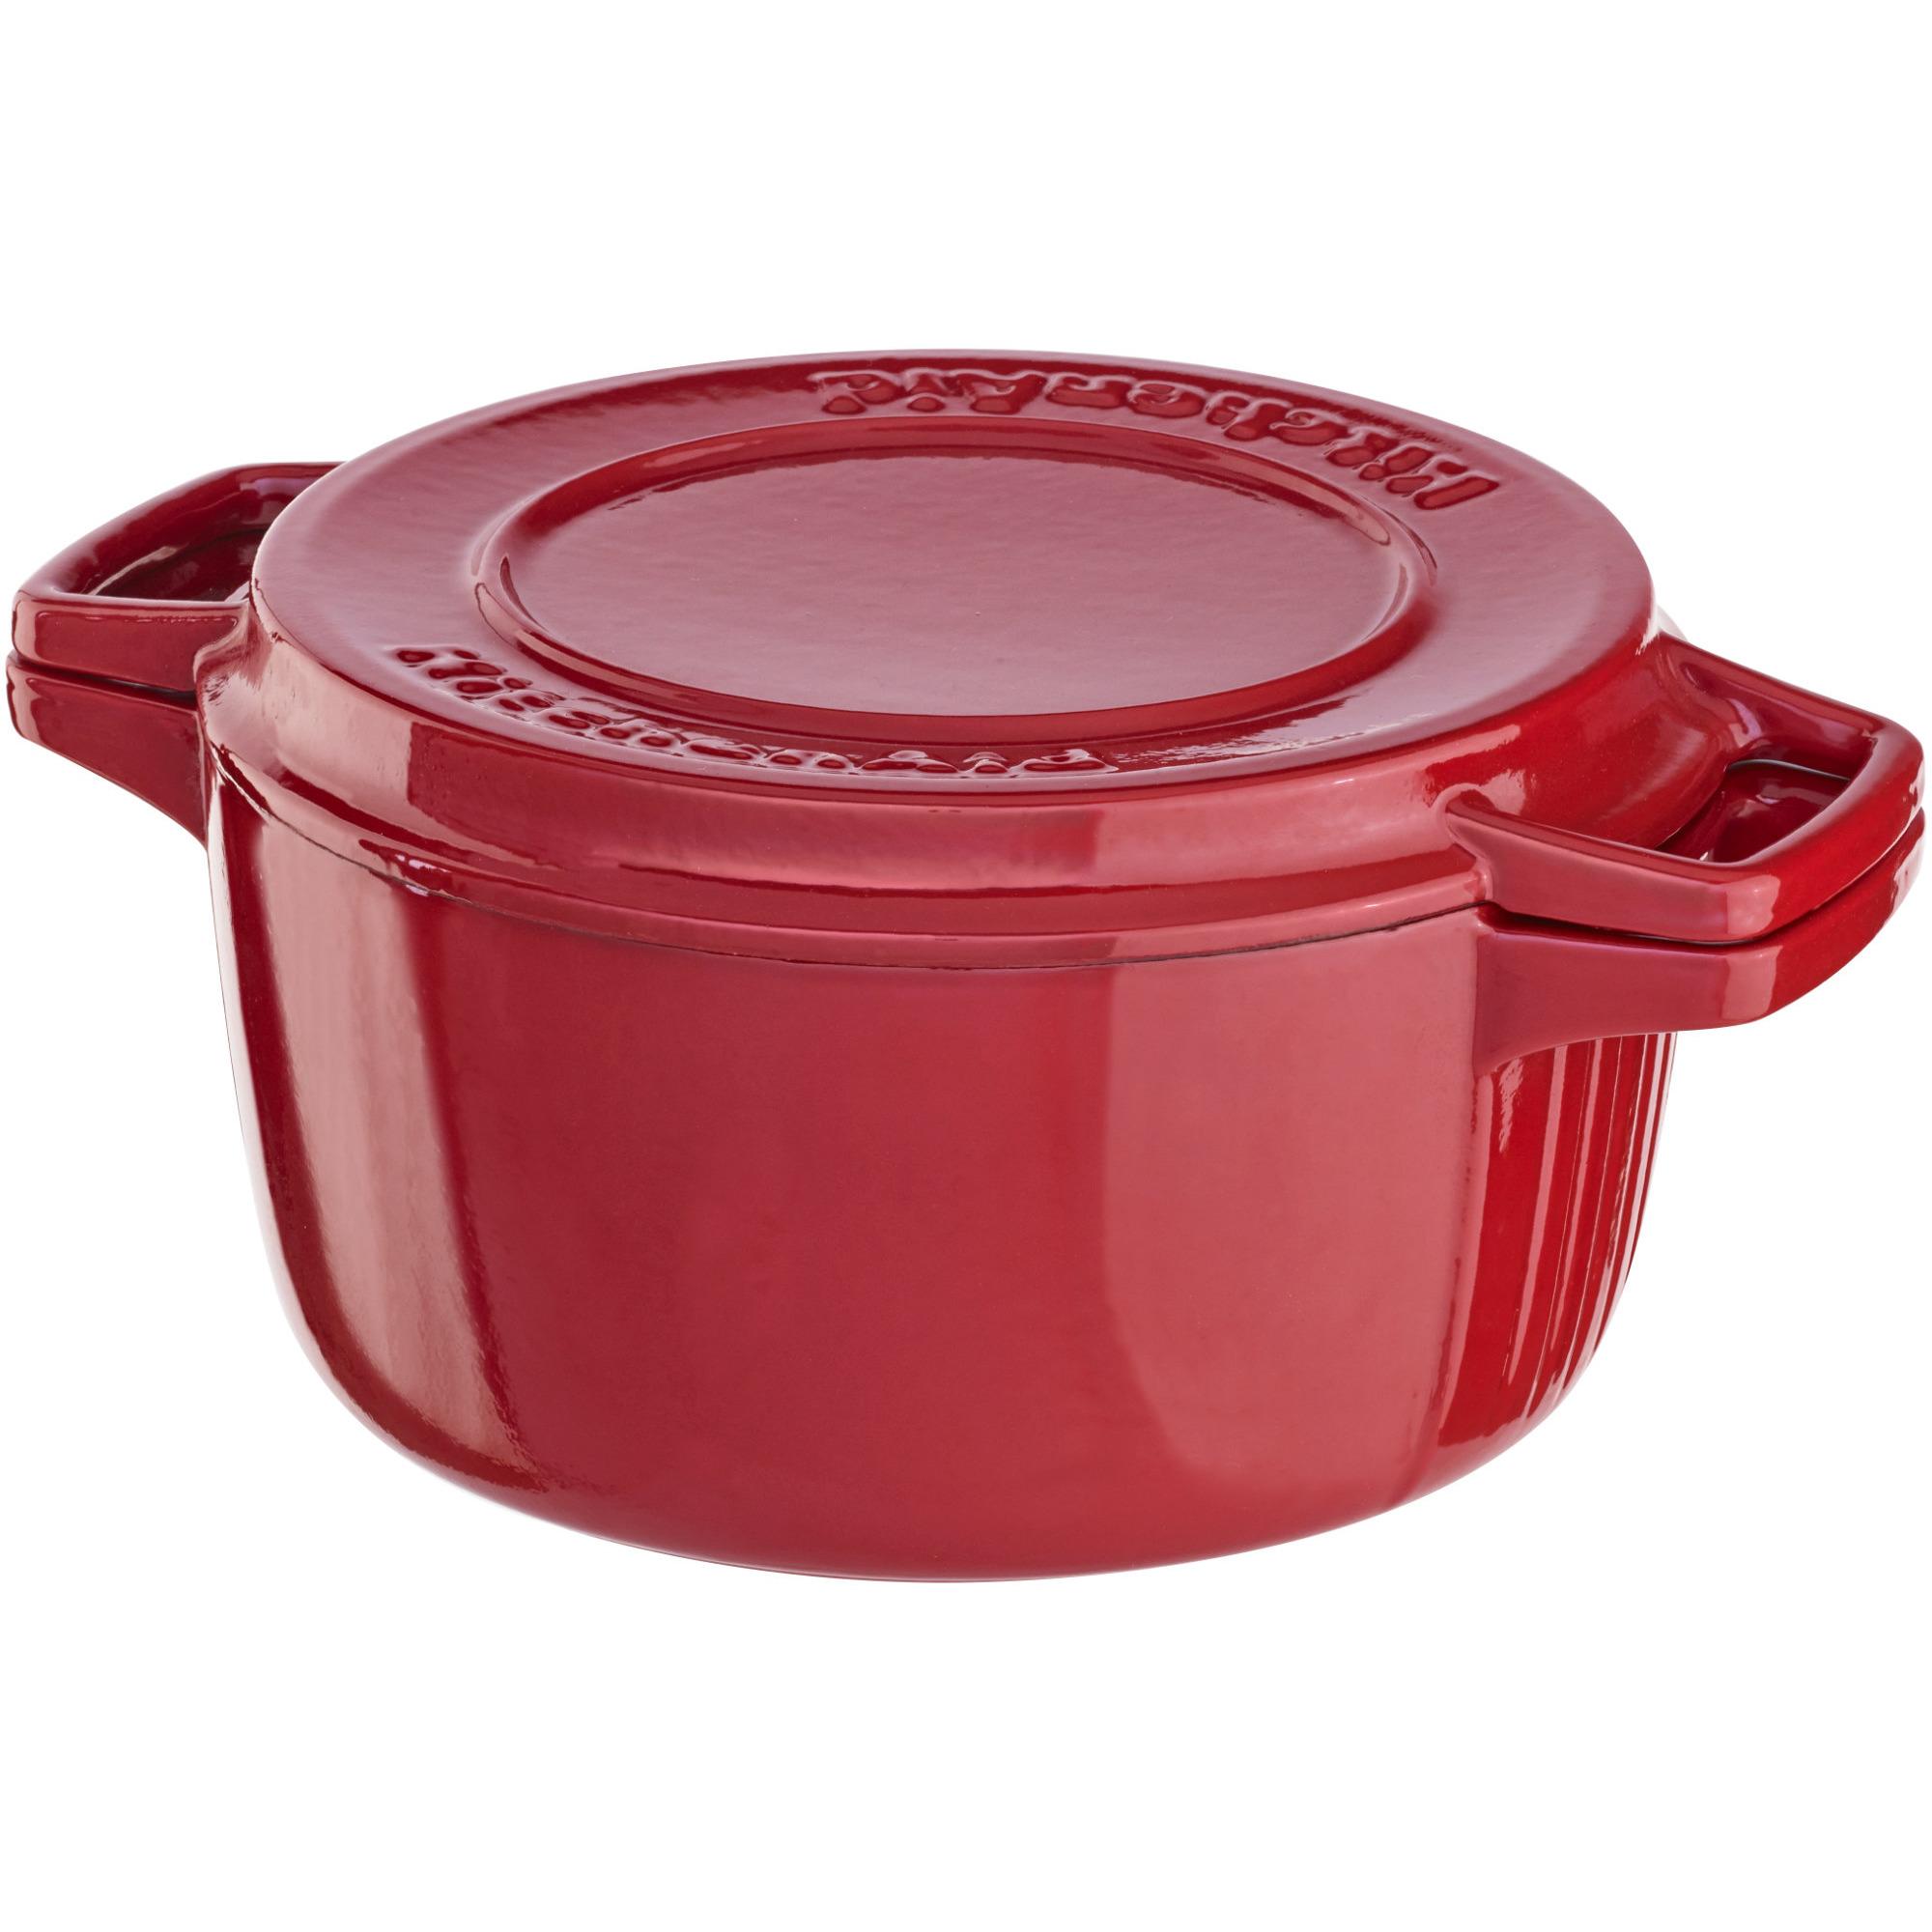 KitchenAid Gjutjärnsgryta 28 cm Röd